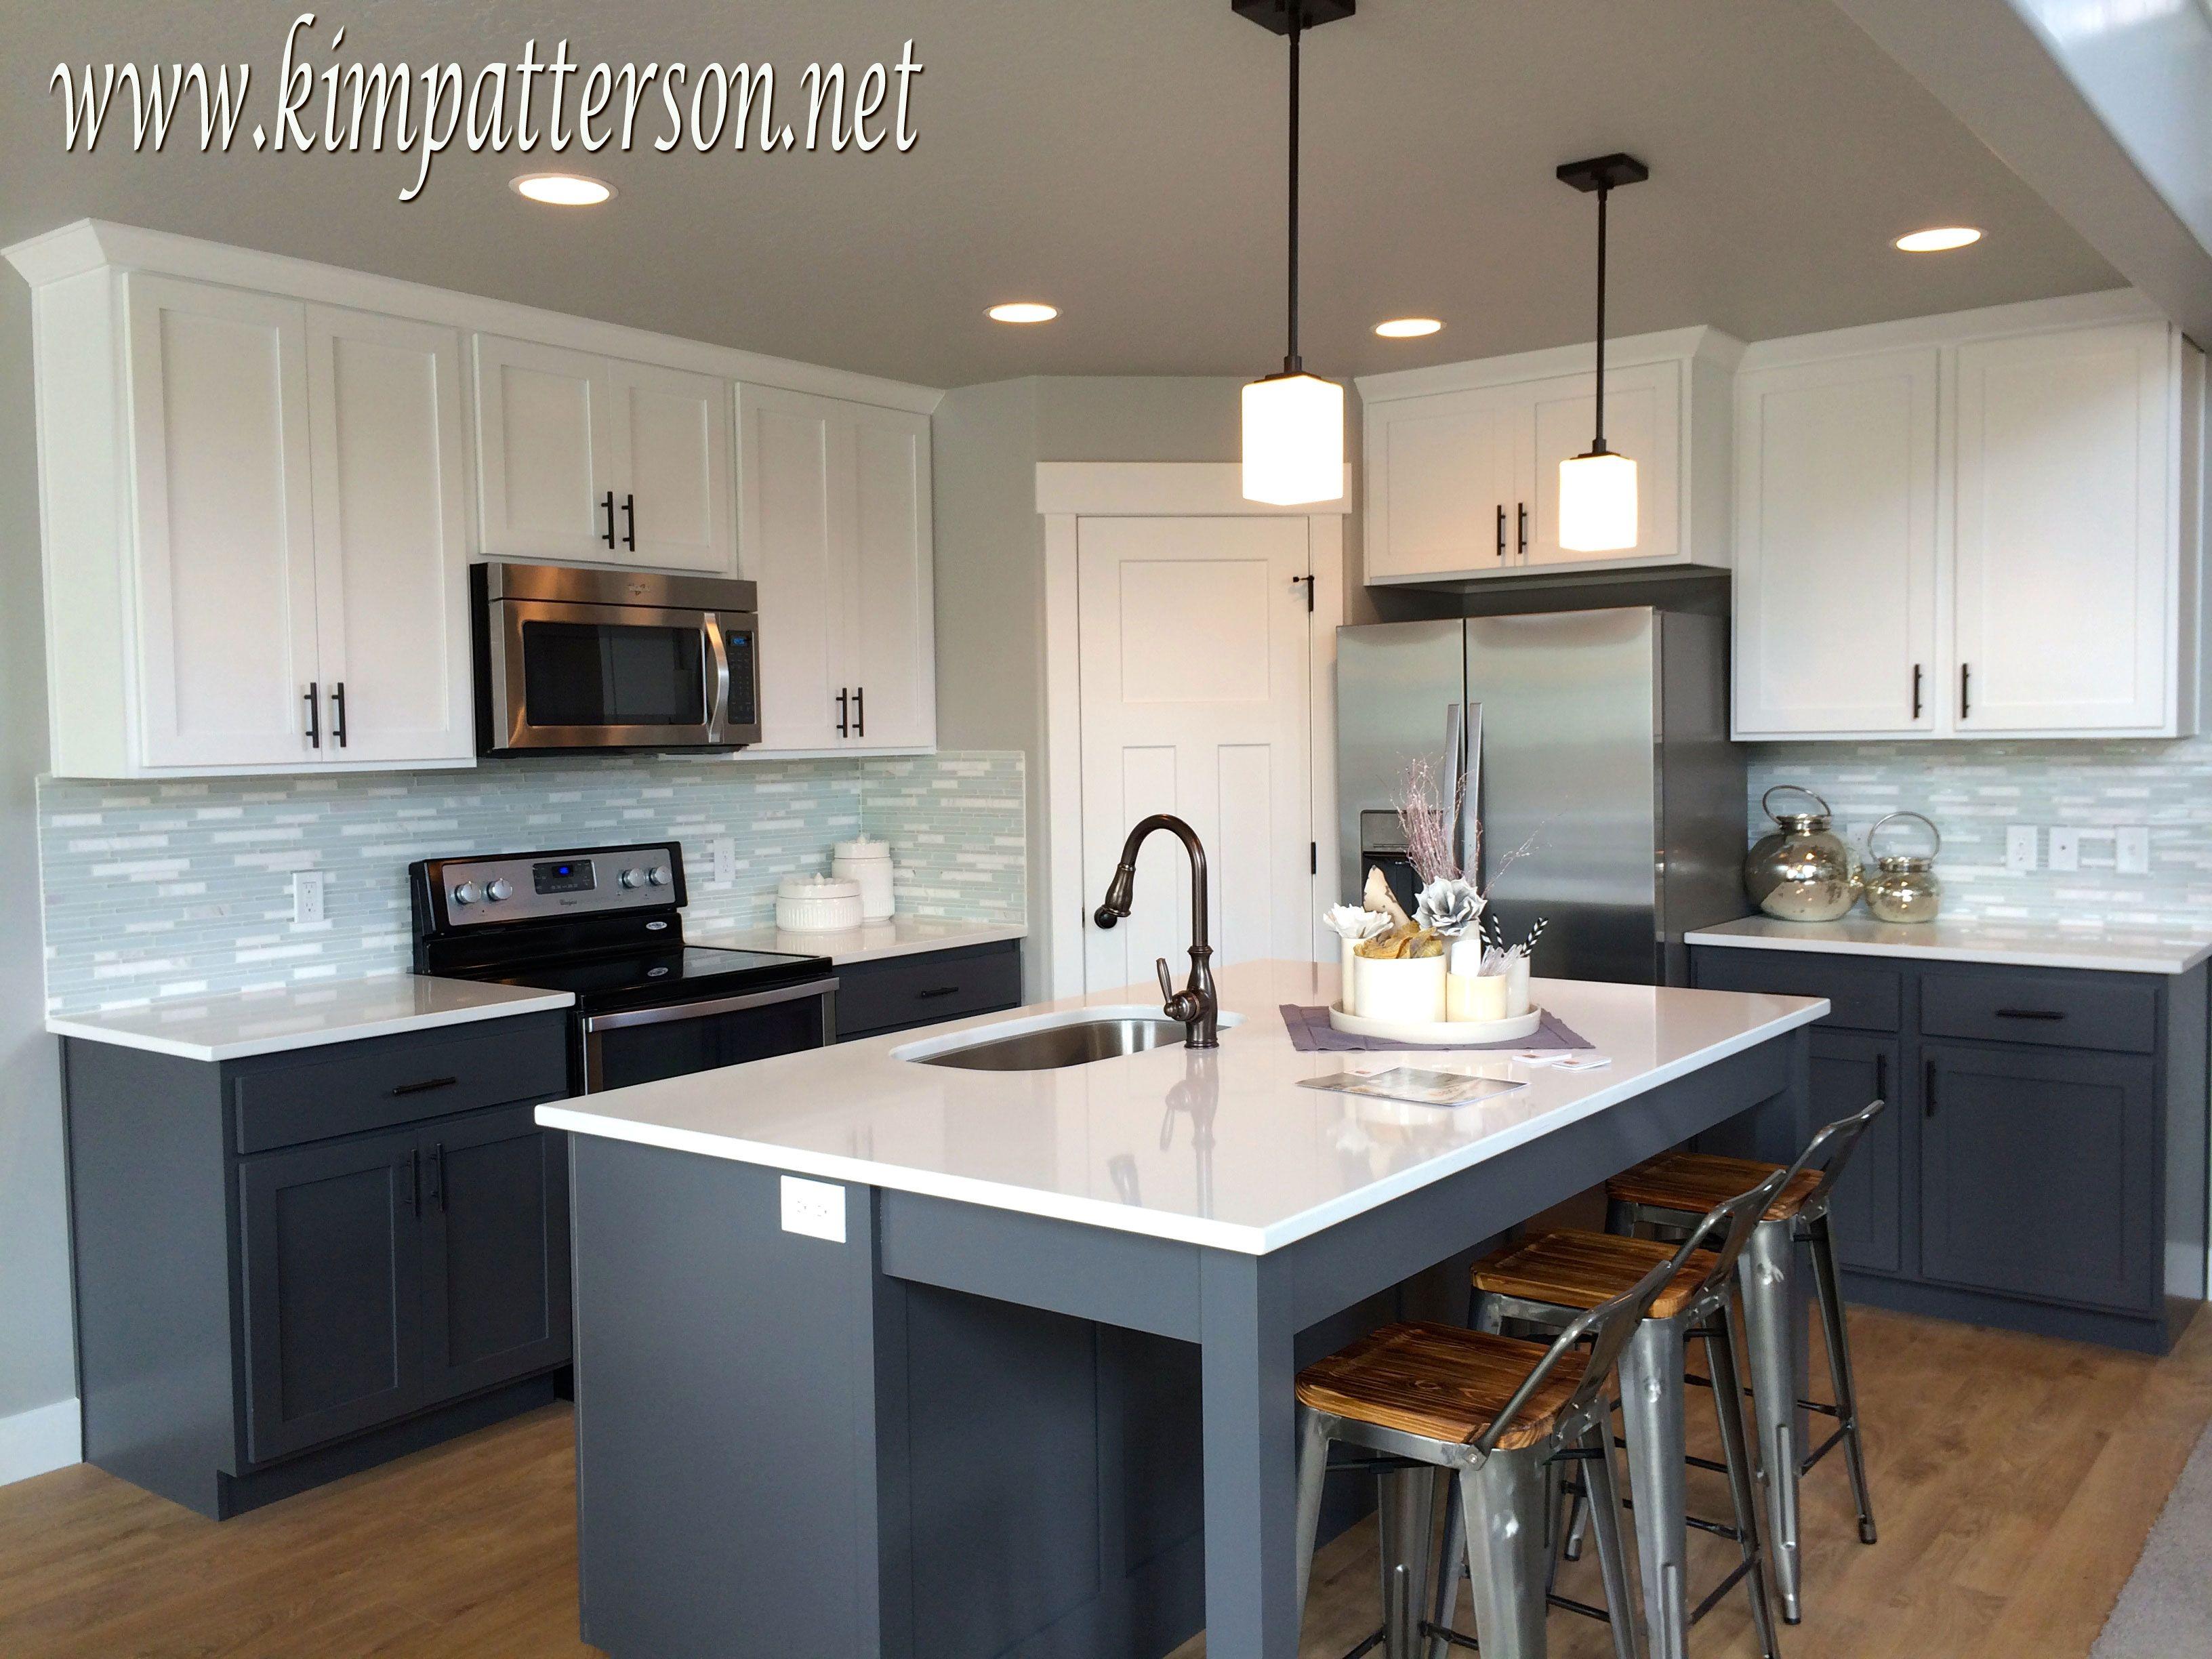 Kitchen Antique White With Black Appliances Grey